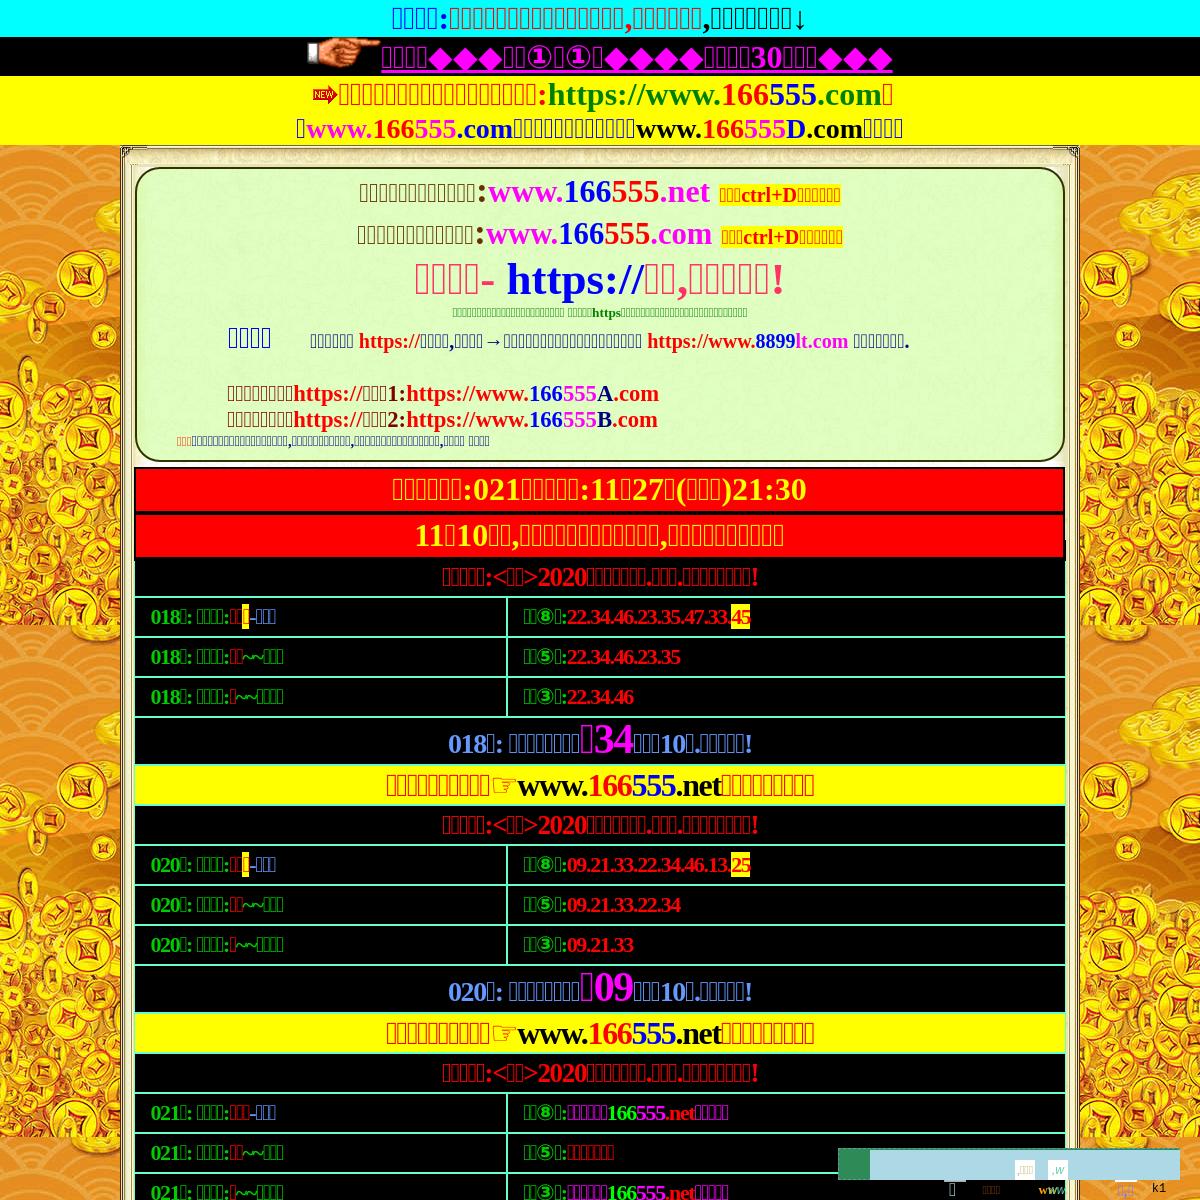 www.112424.com,管家婆论坛,香港管家婆玄机彩图,曾道长22256,好彩堂400500特码,570777.com